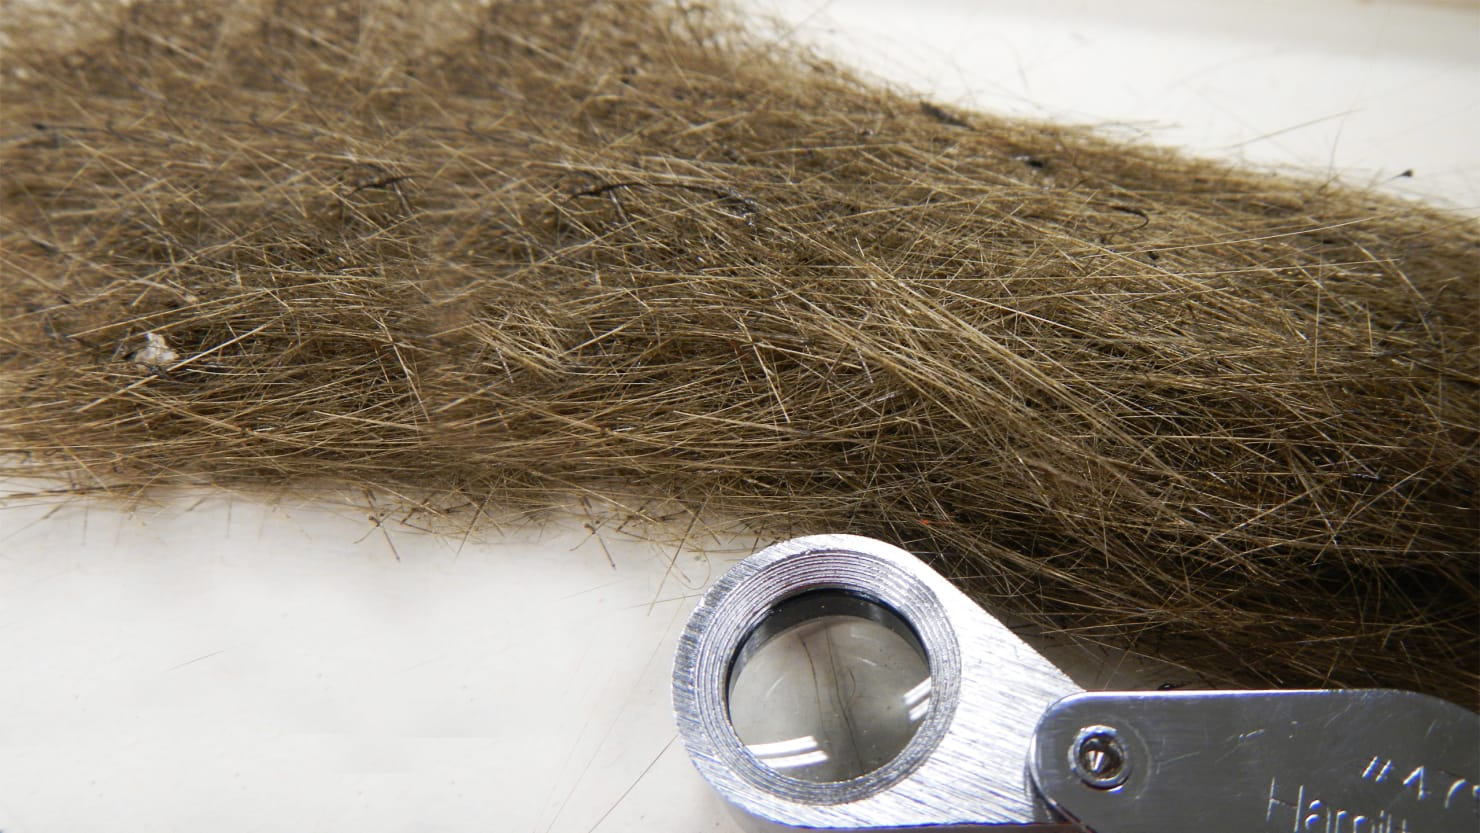 strands of peles hair hawaii volcano mount kilauea lava glass raining tears